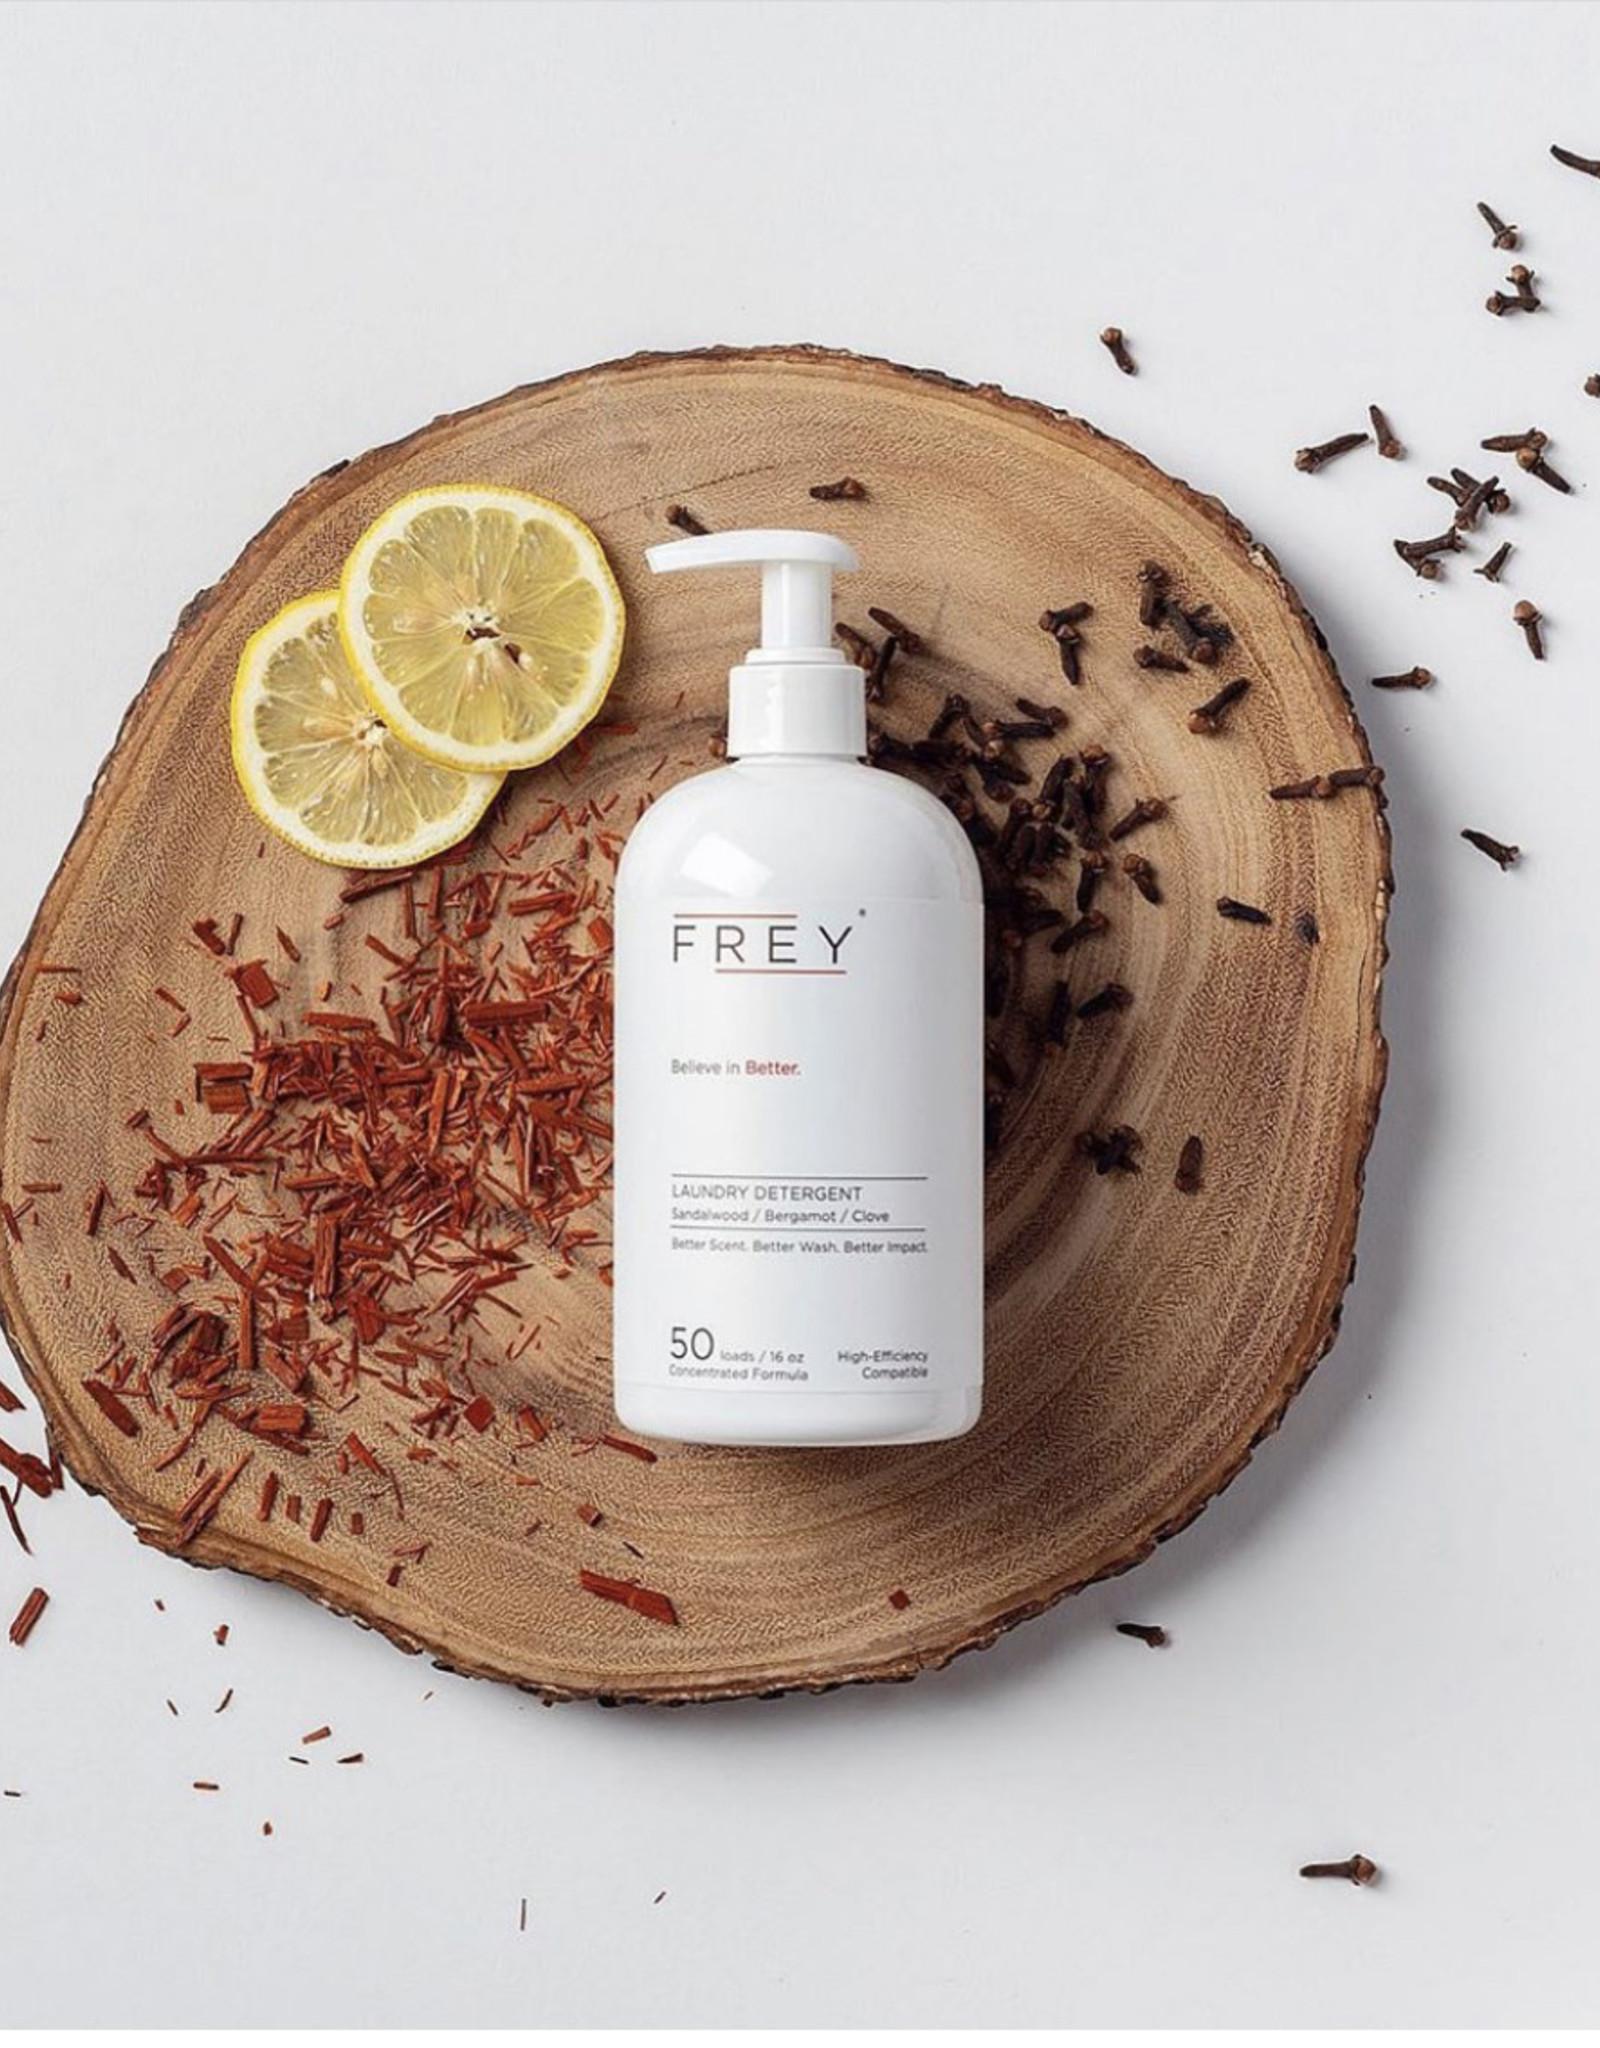 Frey 16oz Laundry Detergent - Sandalwood/Bergamot/Clove